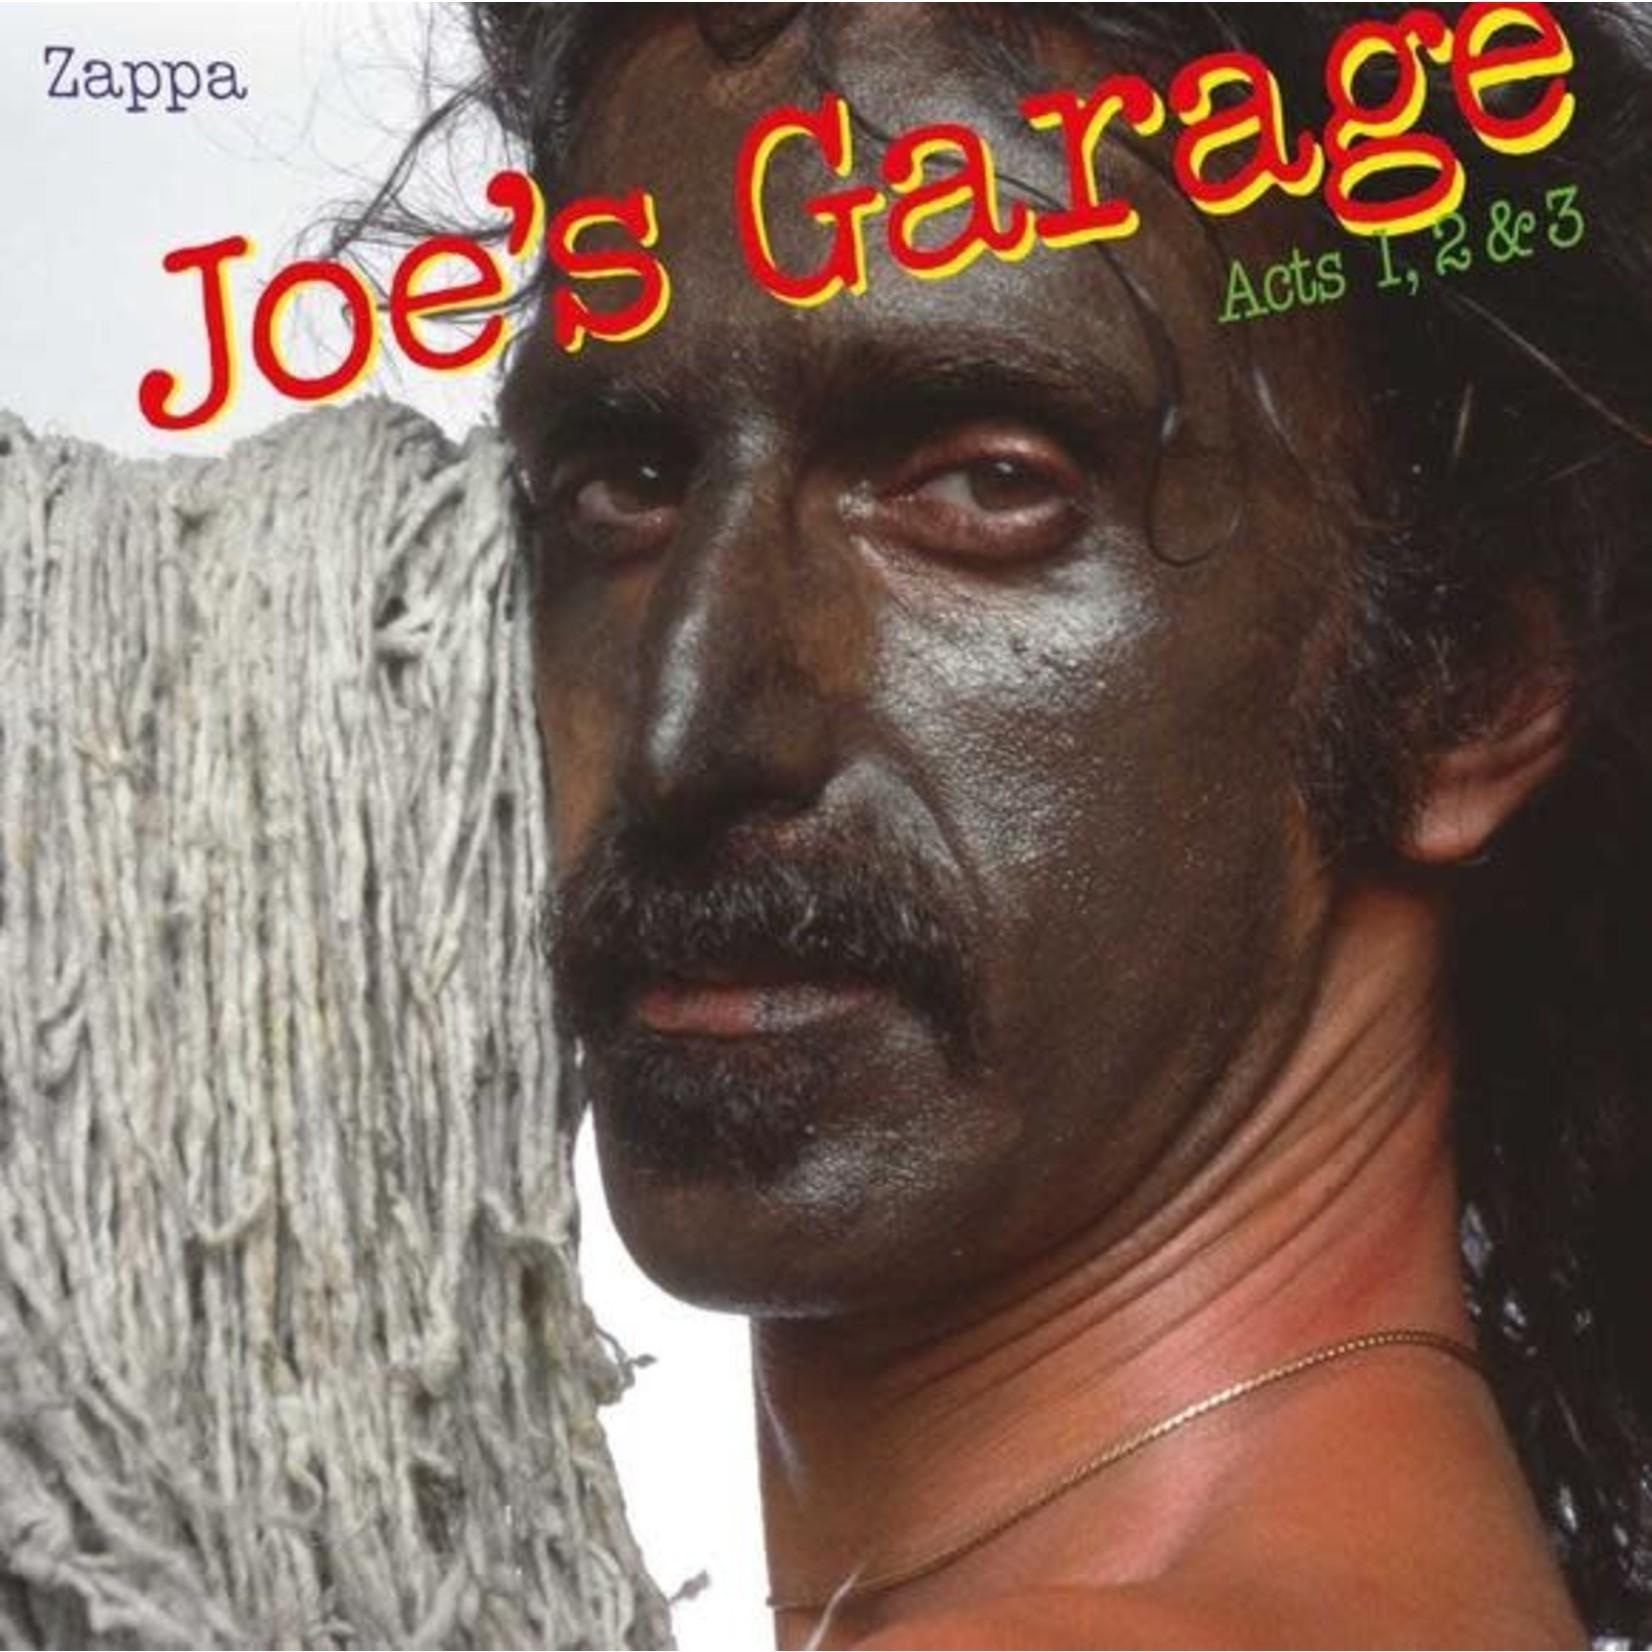 [New] Zappa, Frank: Joe's Garage Acts 1, 2 & 3 (3LP)